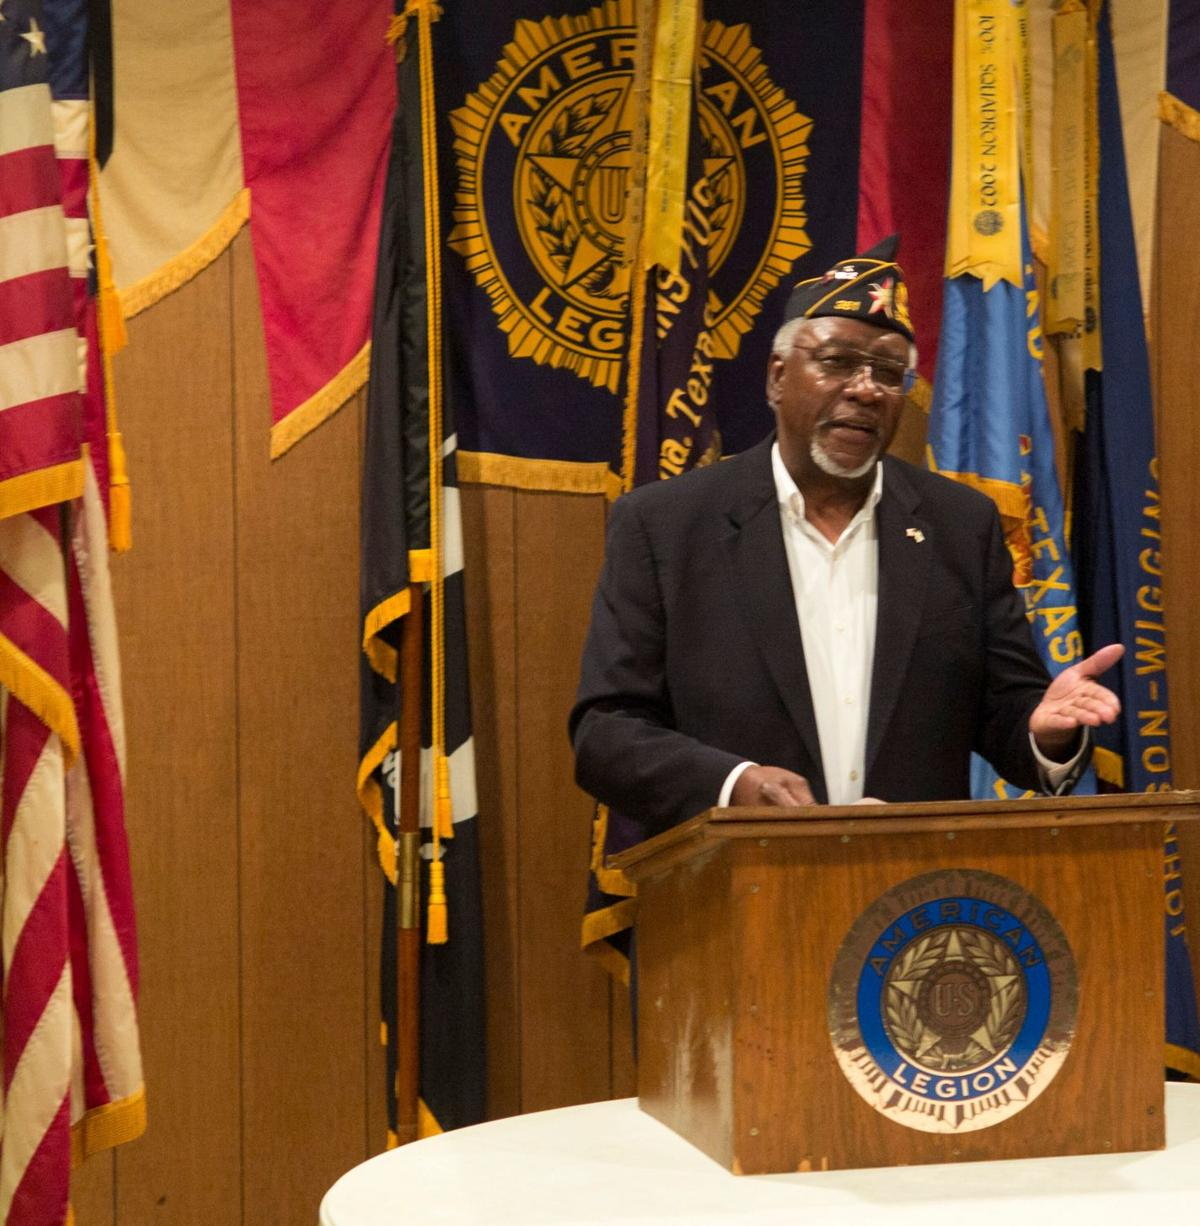 Photos: American Legion Post 22 Celebrates 100 Years